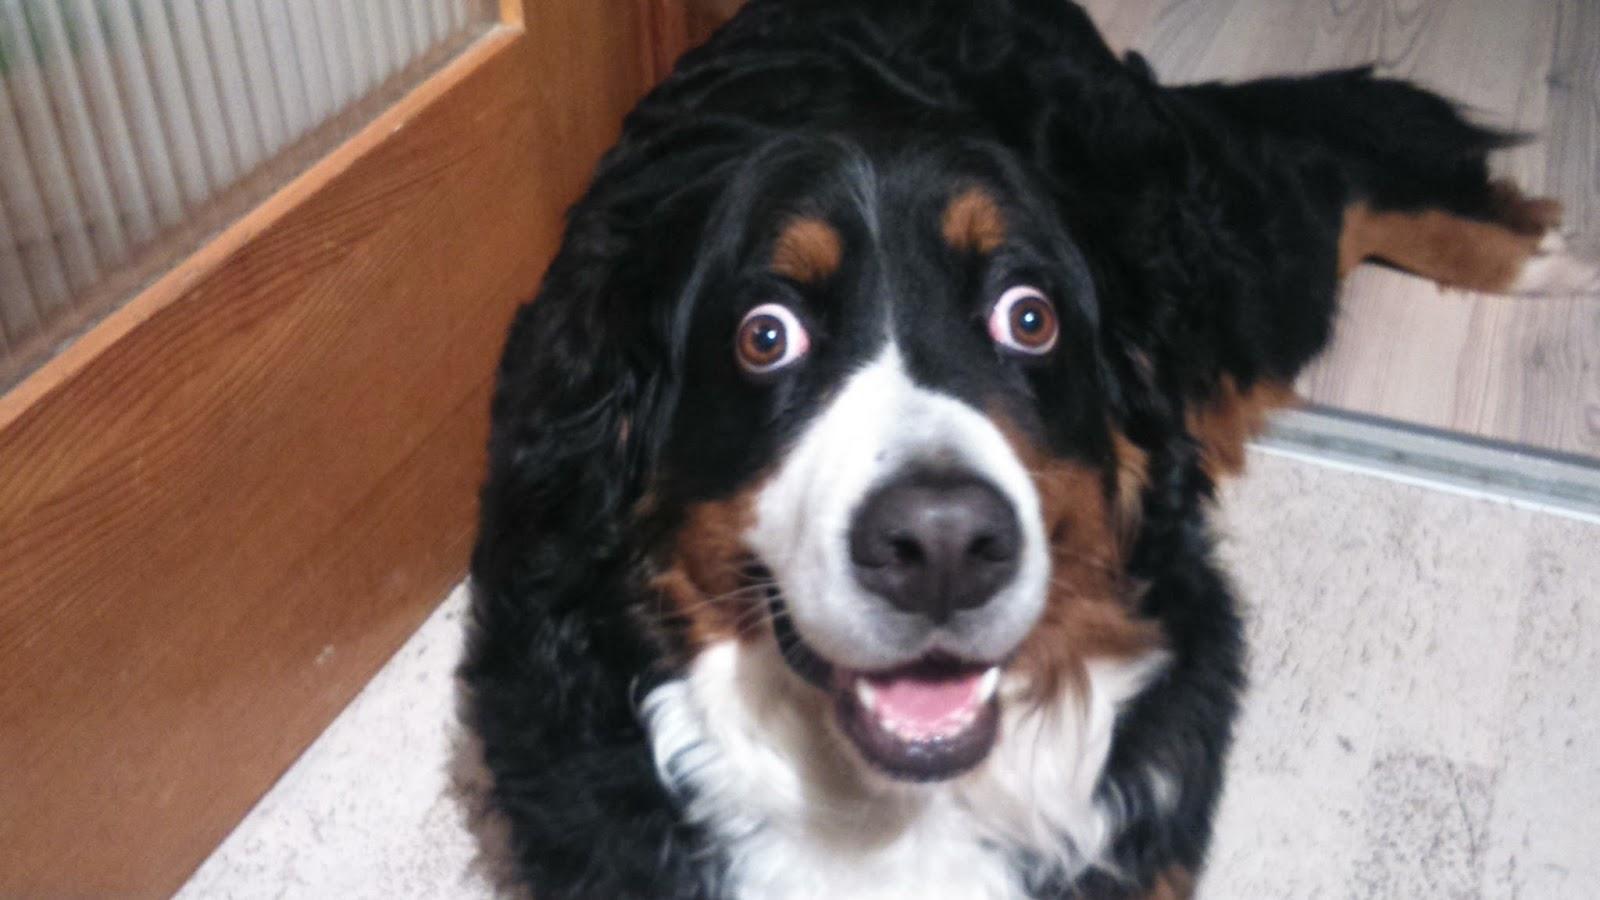 Hunden herpes bei Herpes beim